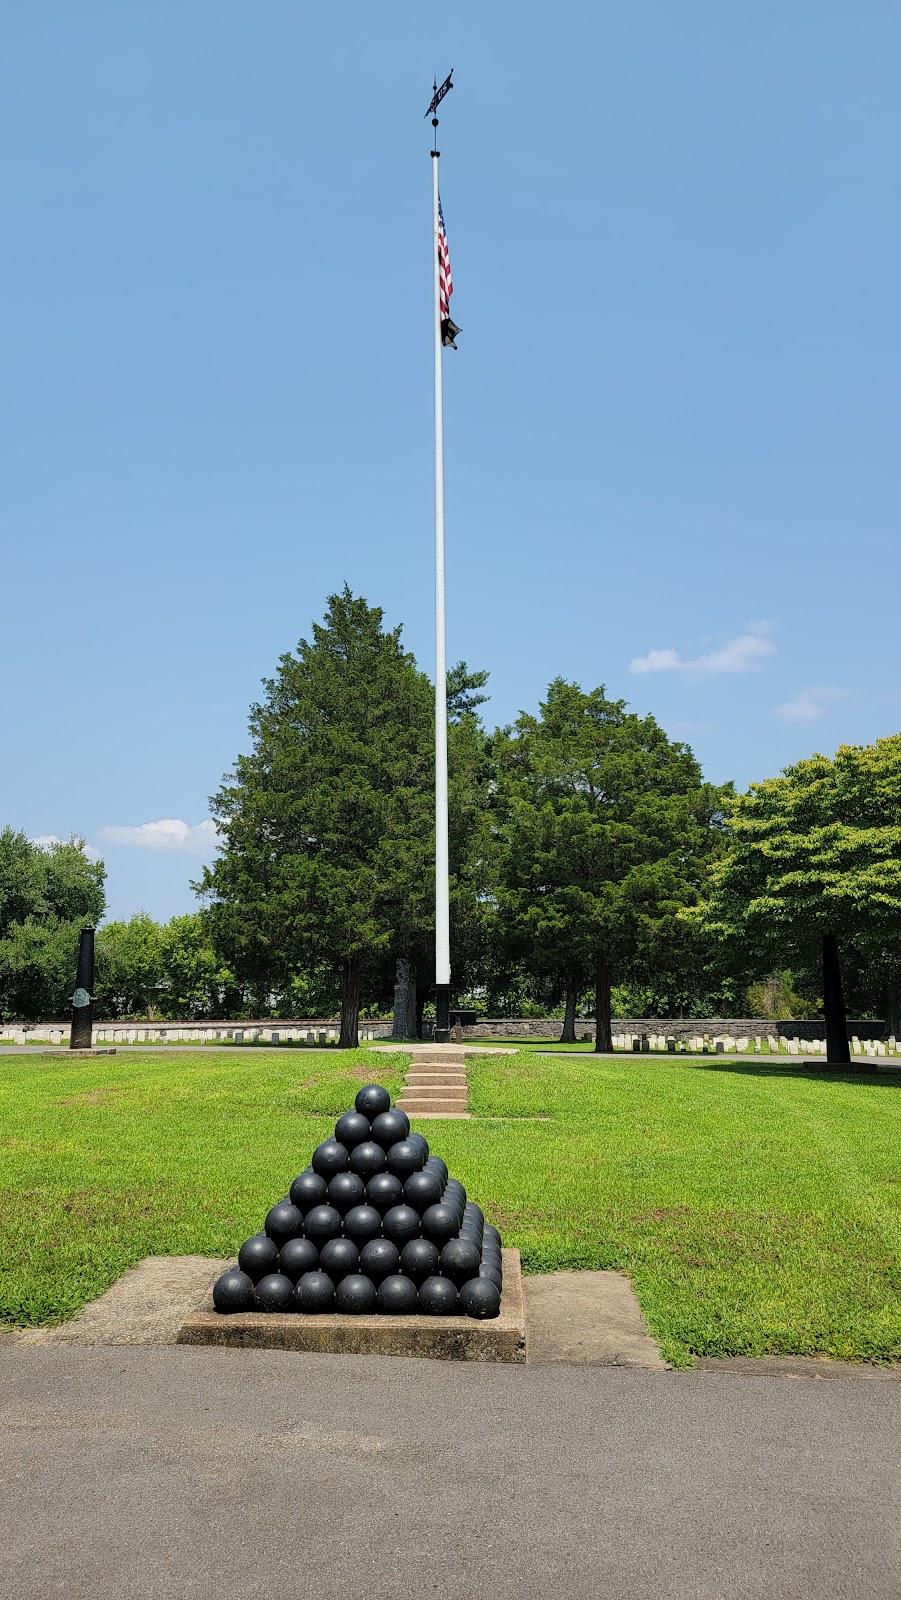 Stones River National Battlefield - museum  | Photo 10 of 10 | Address: 3501 Old Nashville Hwy, Murfreesboro, TN 37129, USA | Phone: (615) 893-9501